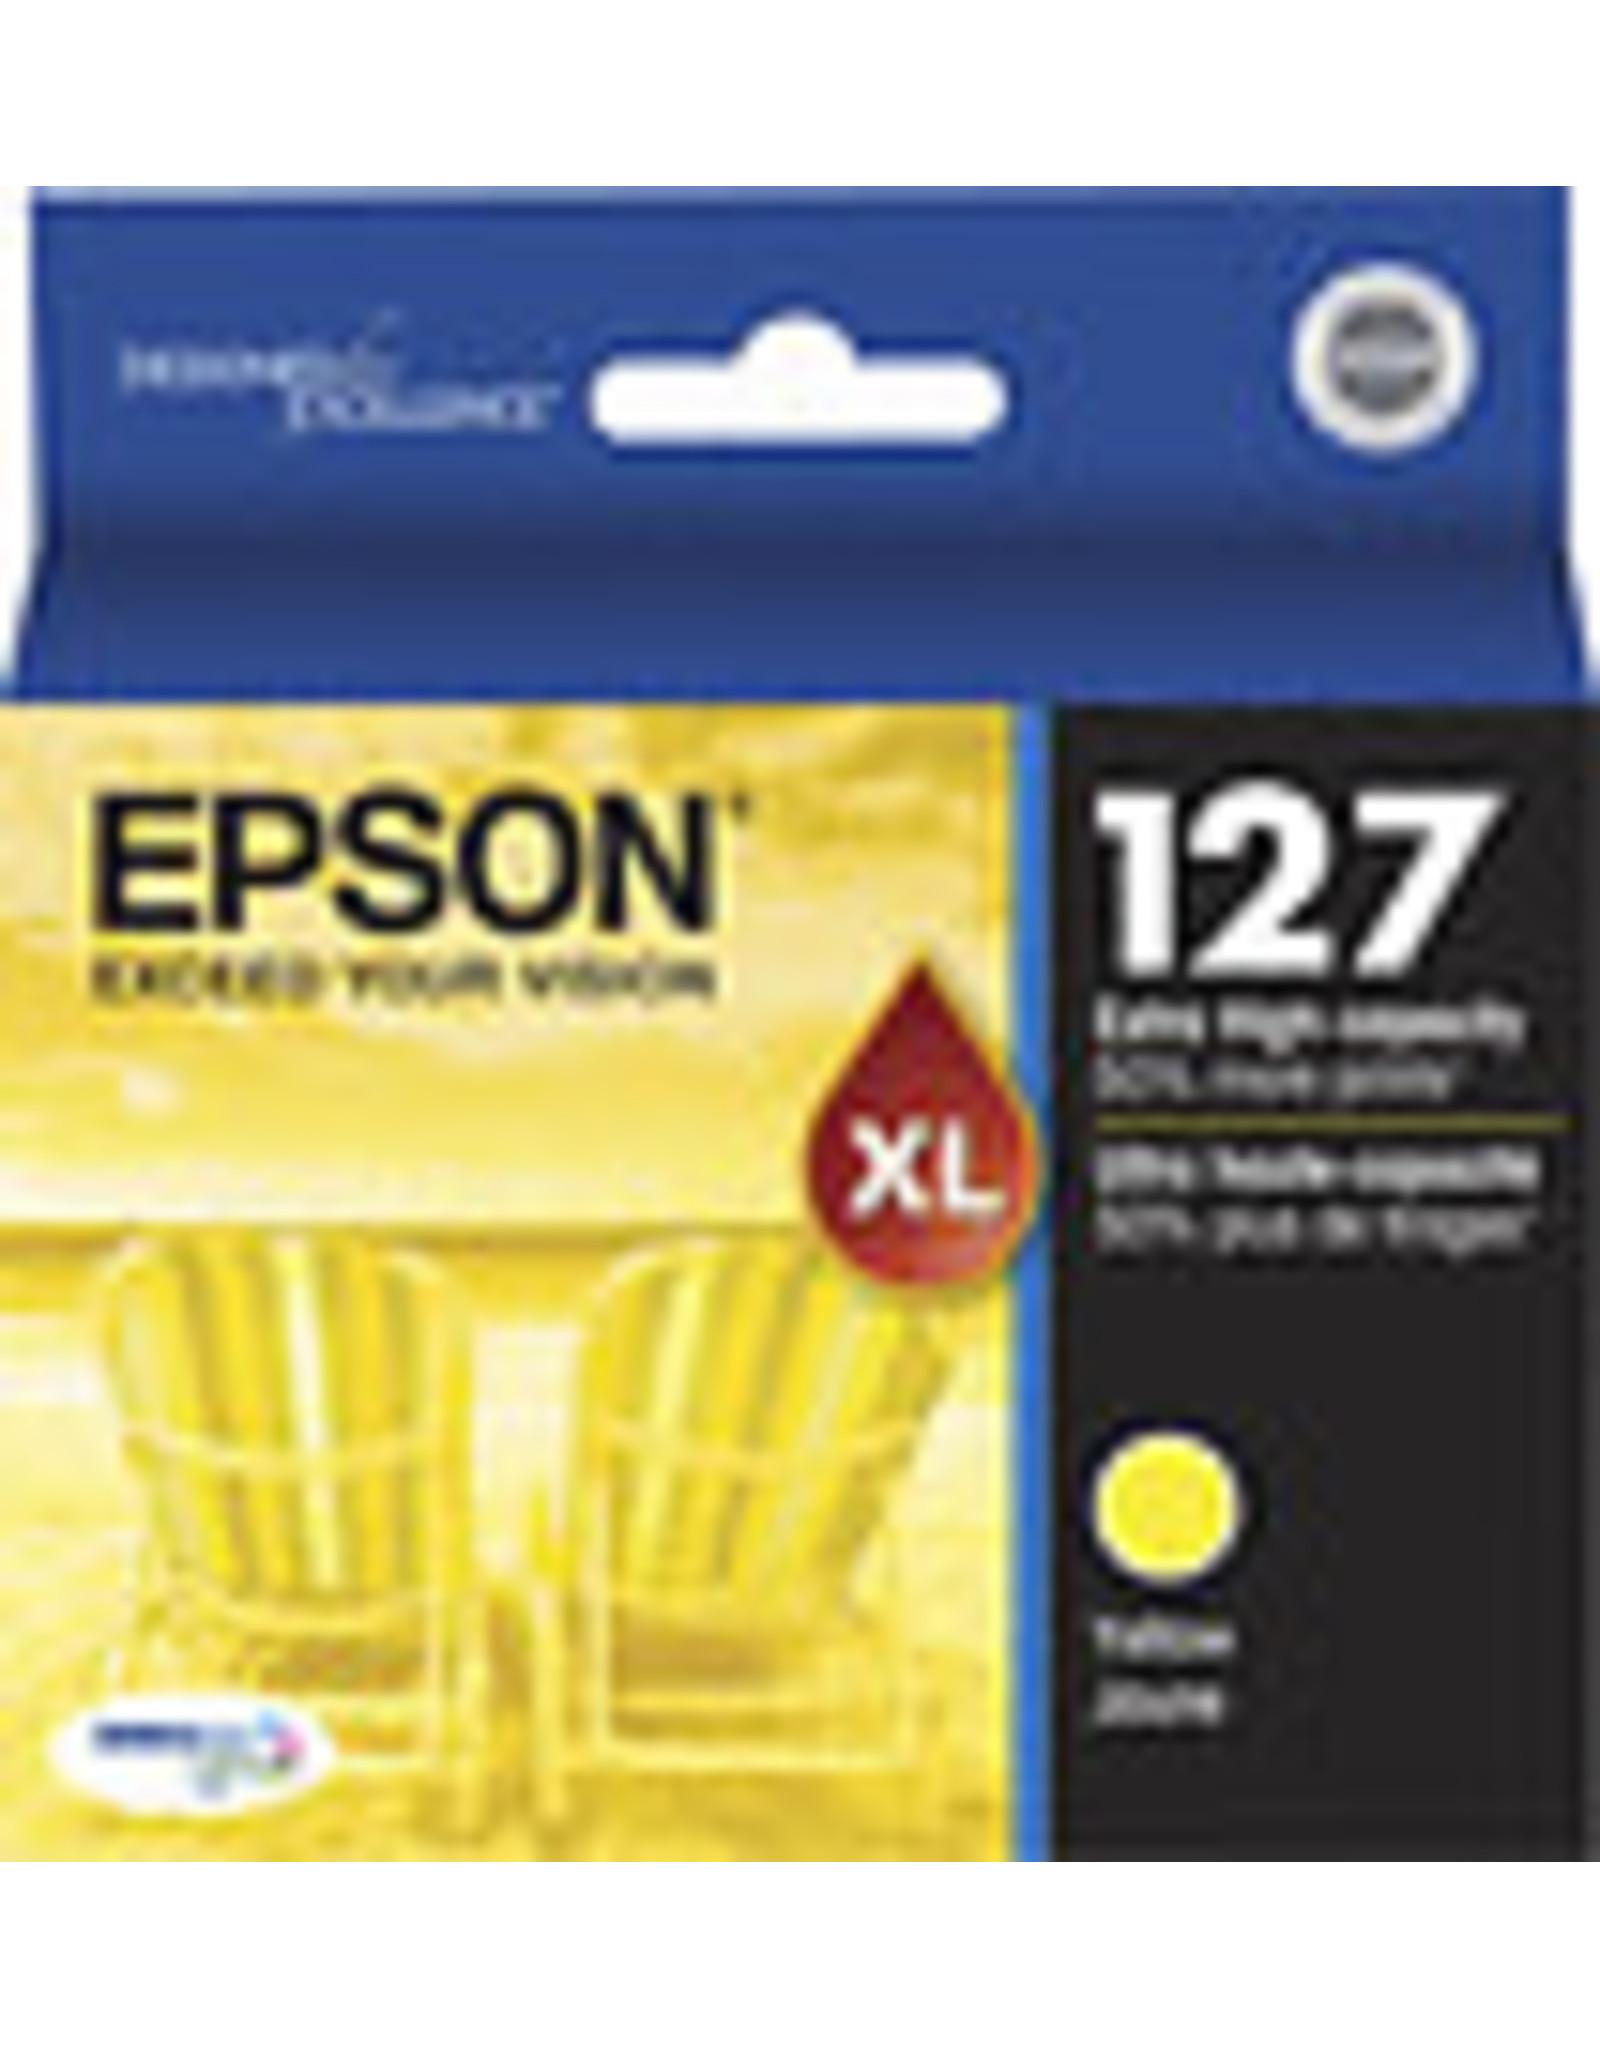 Epson INKJET CARTRIDGE-EPSON #127XL YELLOW EXTRA HIGH YIELD